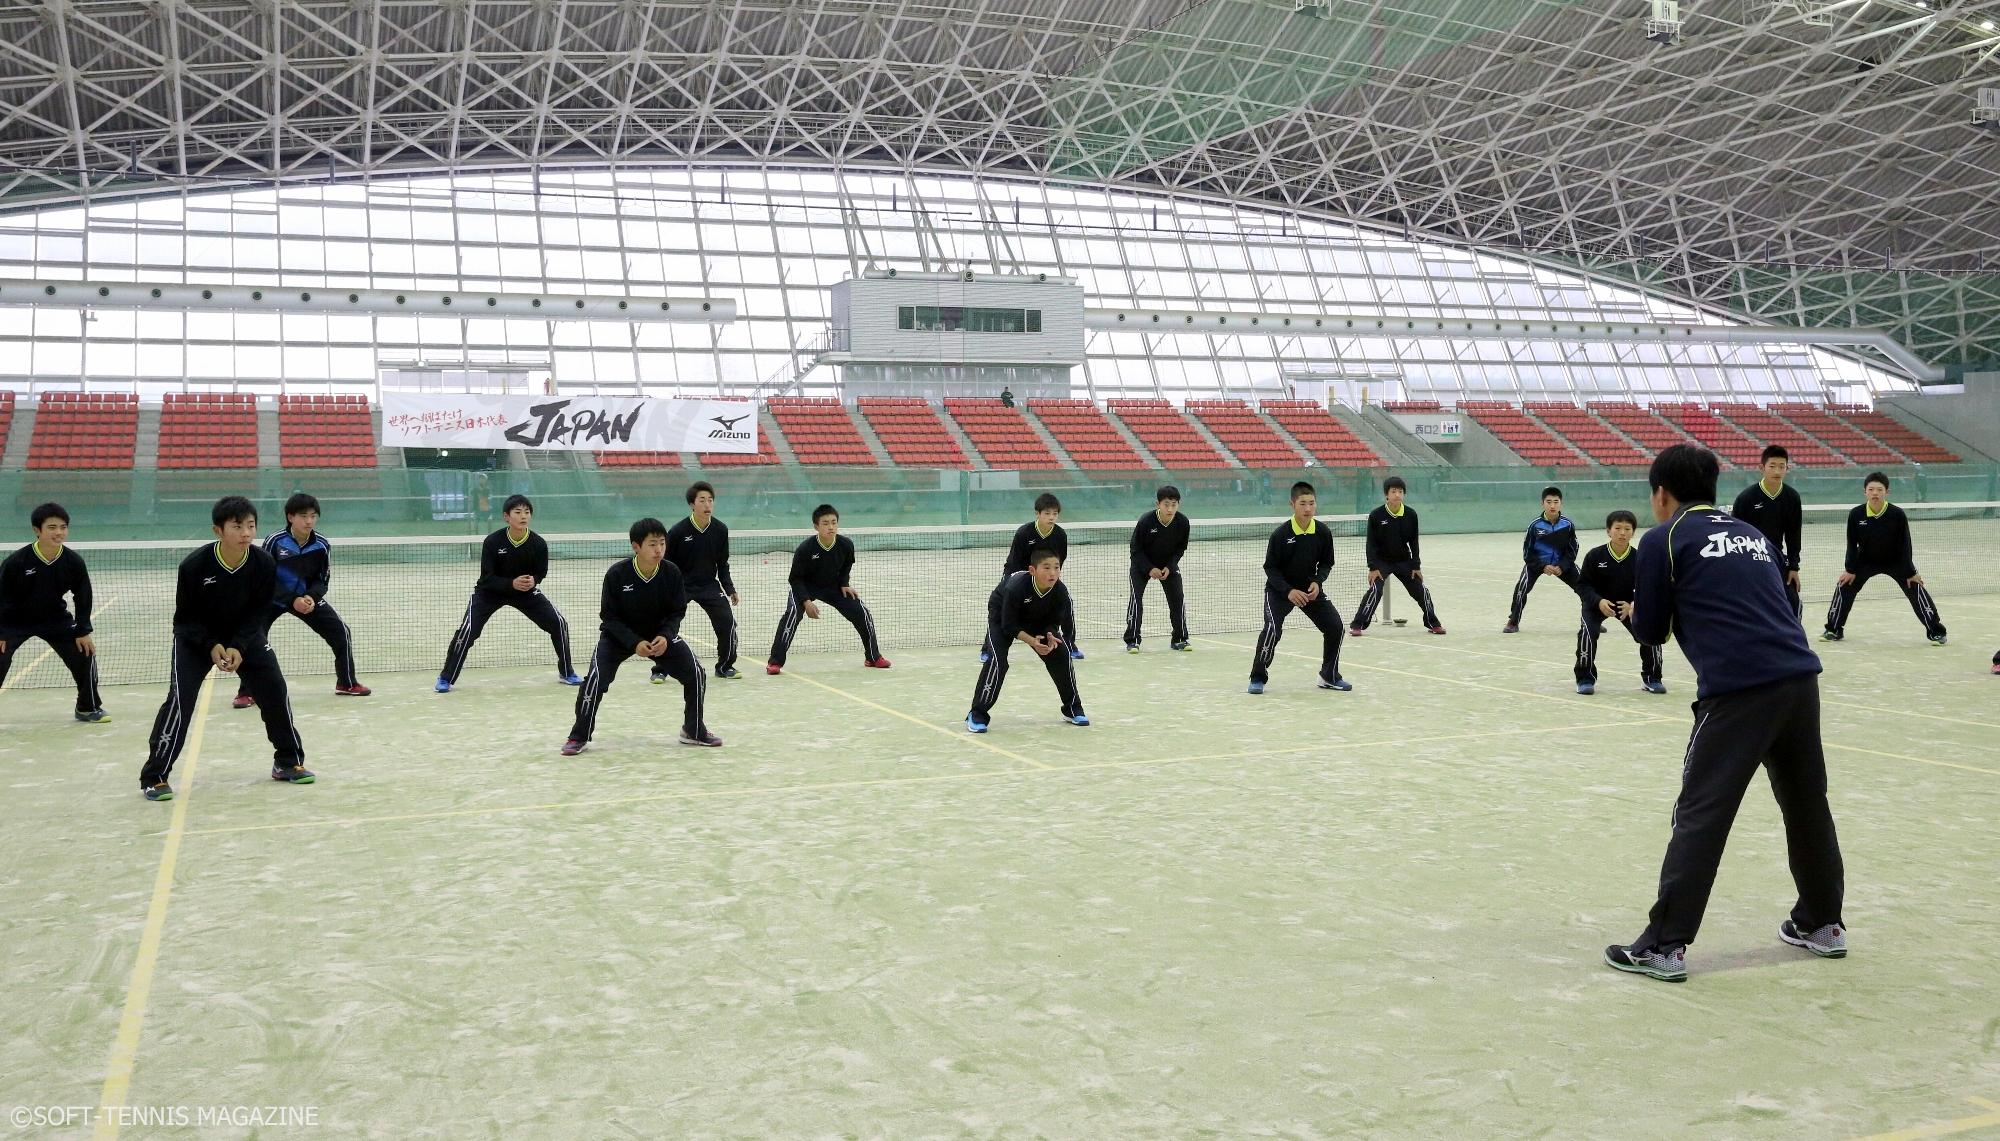 U-14男子が合宿で取り組んでいたトレーニングをレポート!